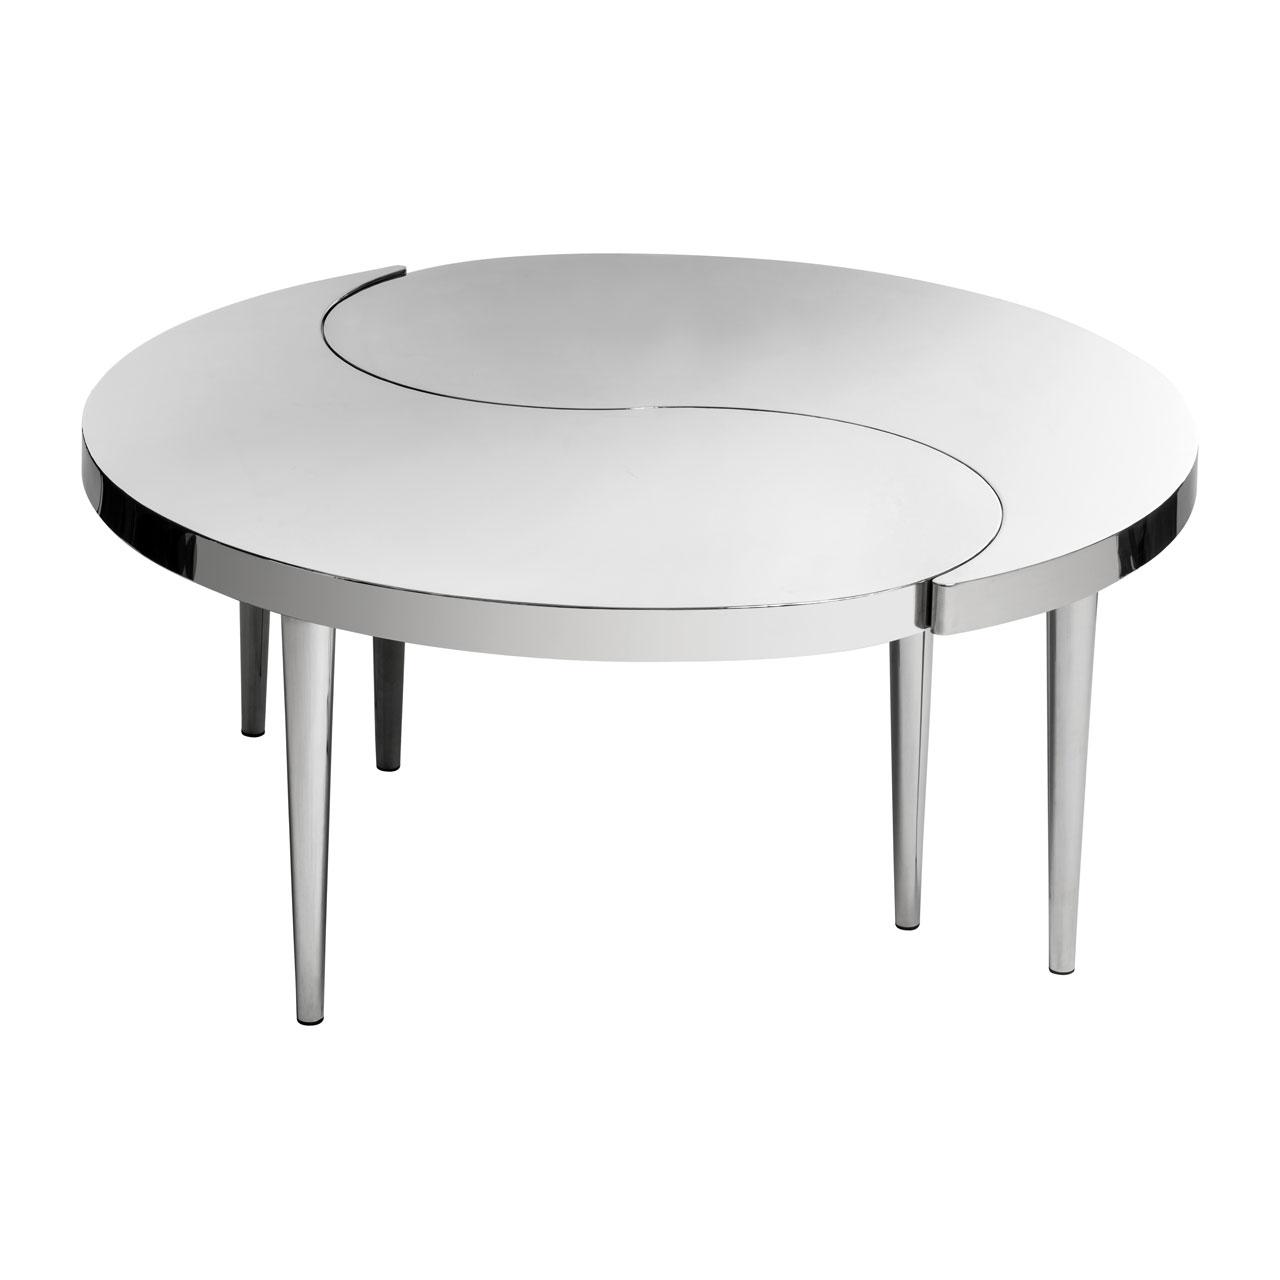 Kyra White Gloss Rotating Coffee Table